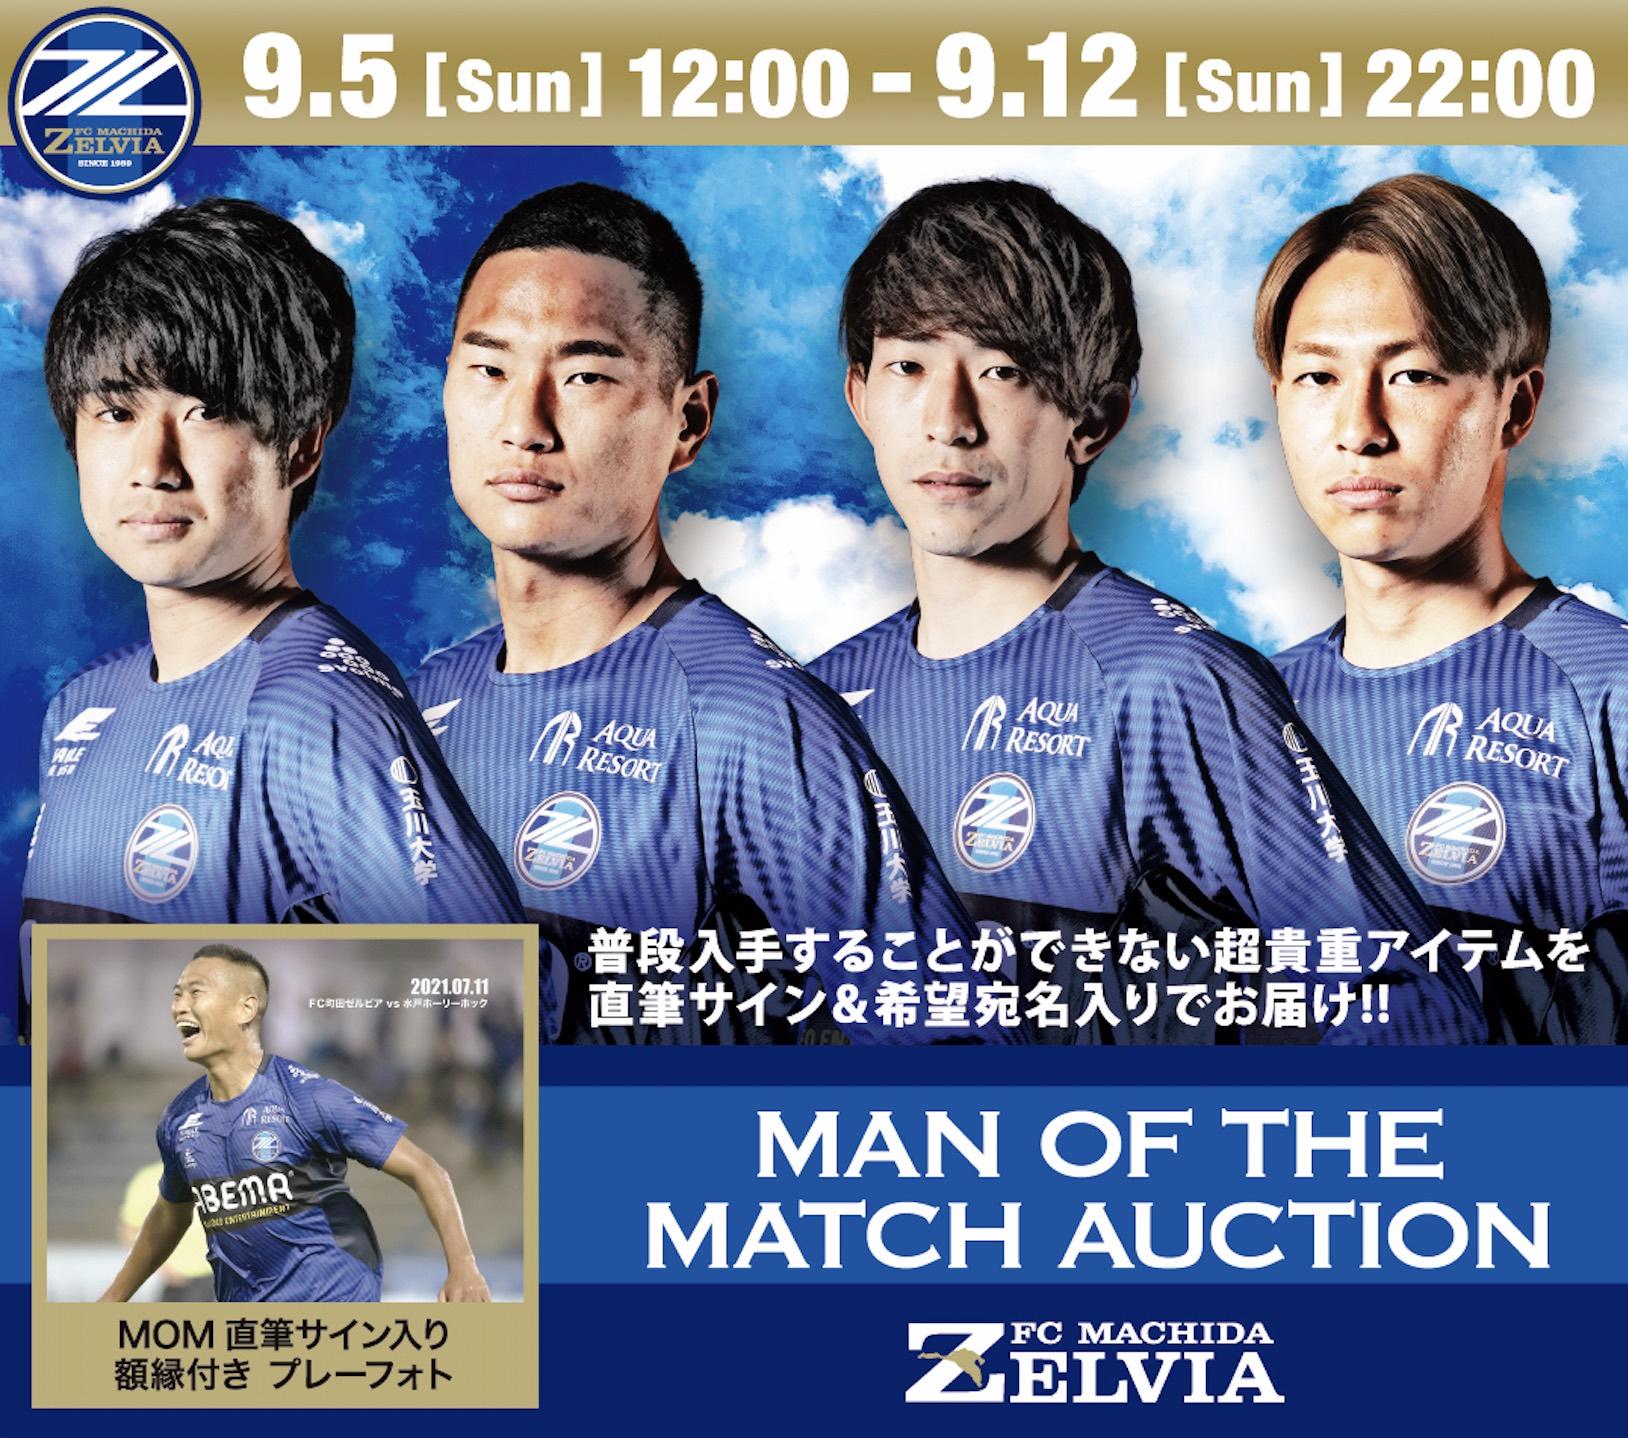 FC町田ゼルビア「マン・オブ・ザ・マッチ」オークション(8月、9月)